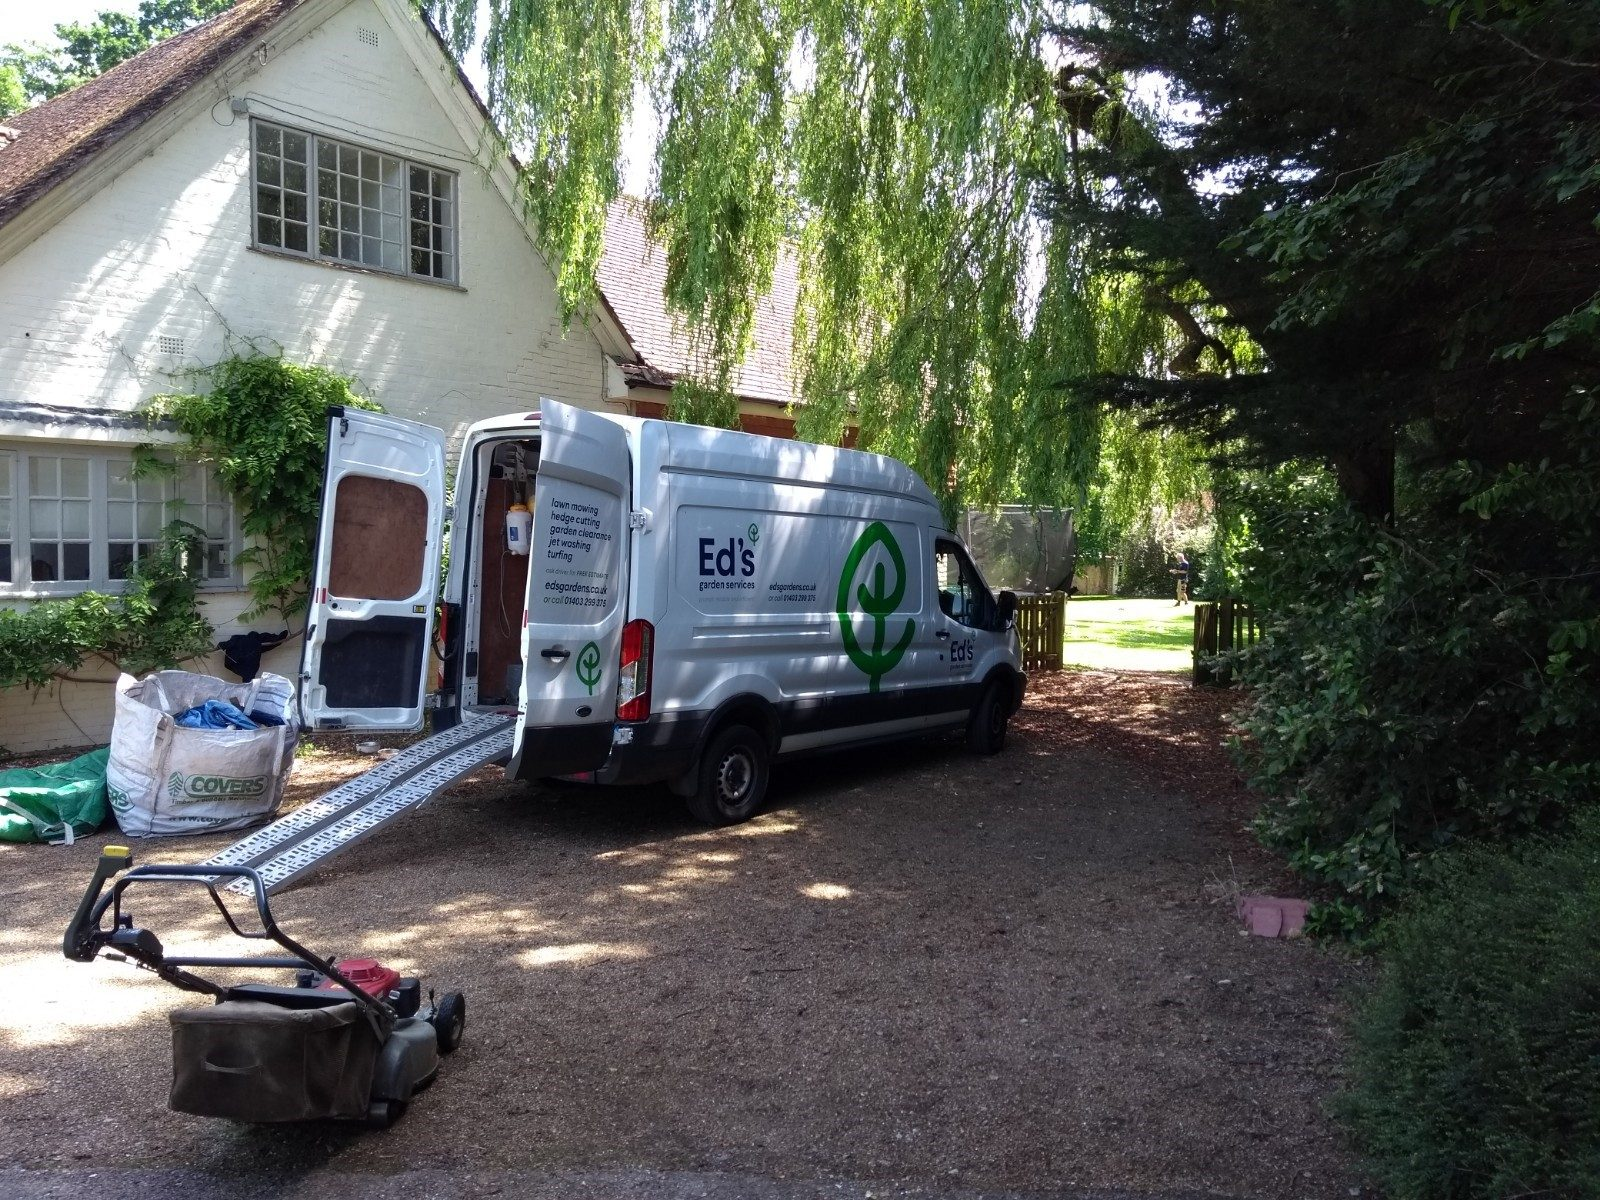 Tunbridge Wells Gardening business equipment